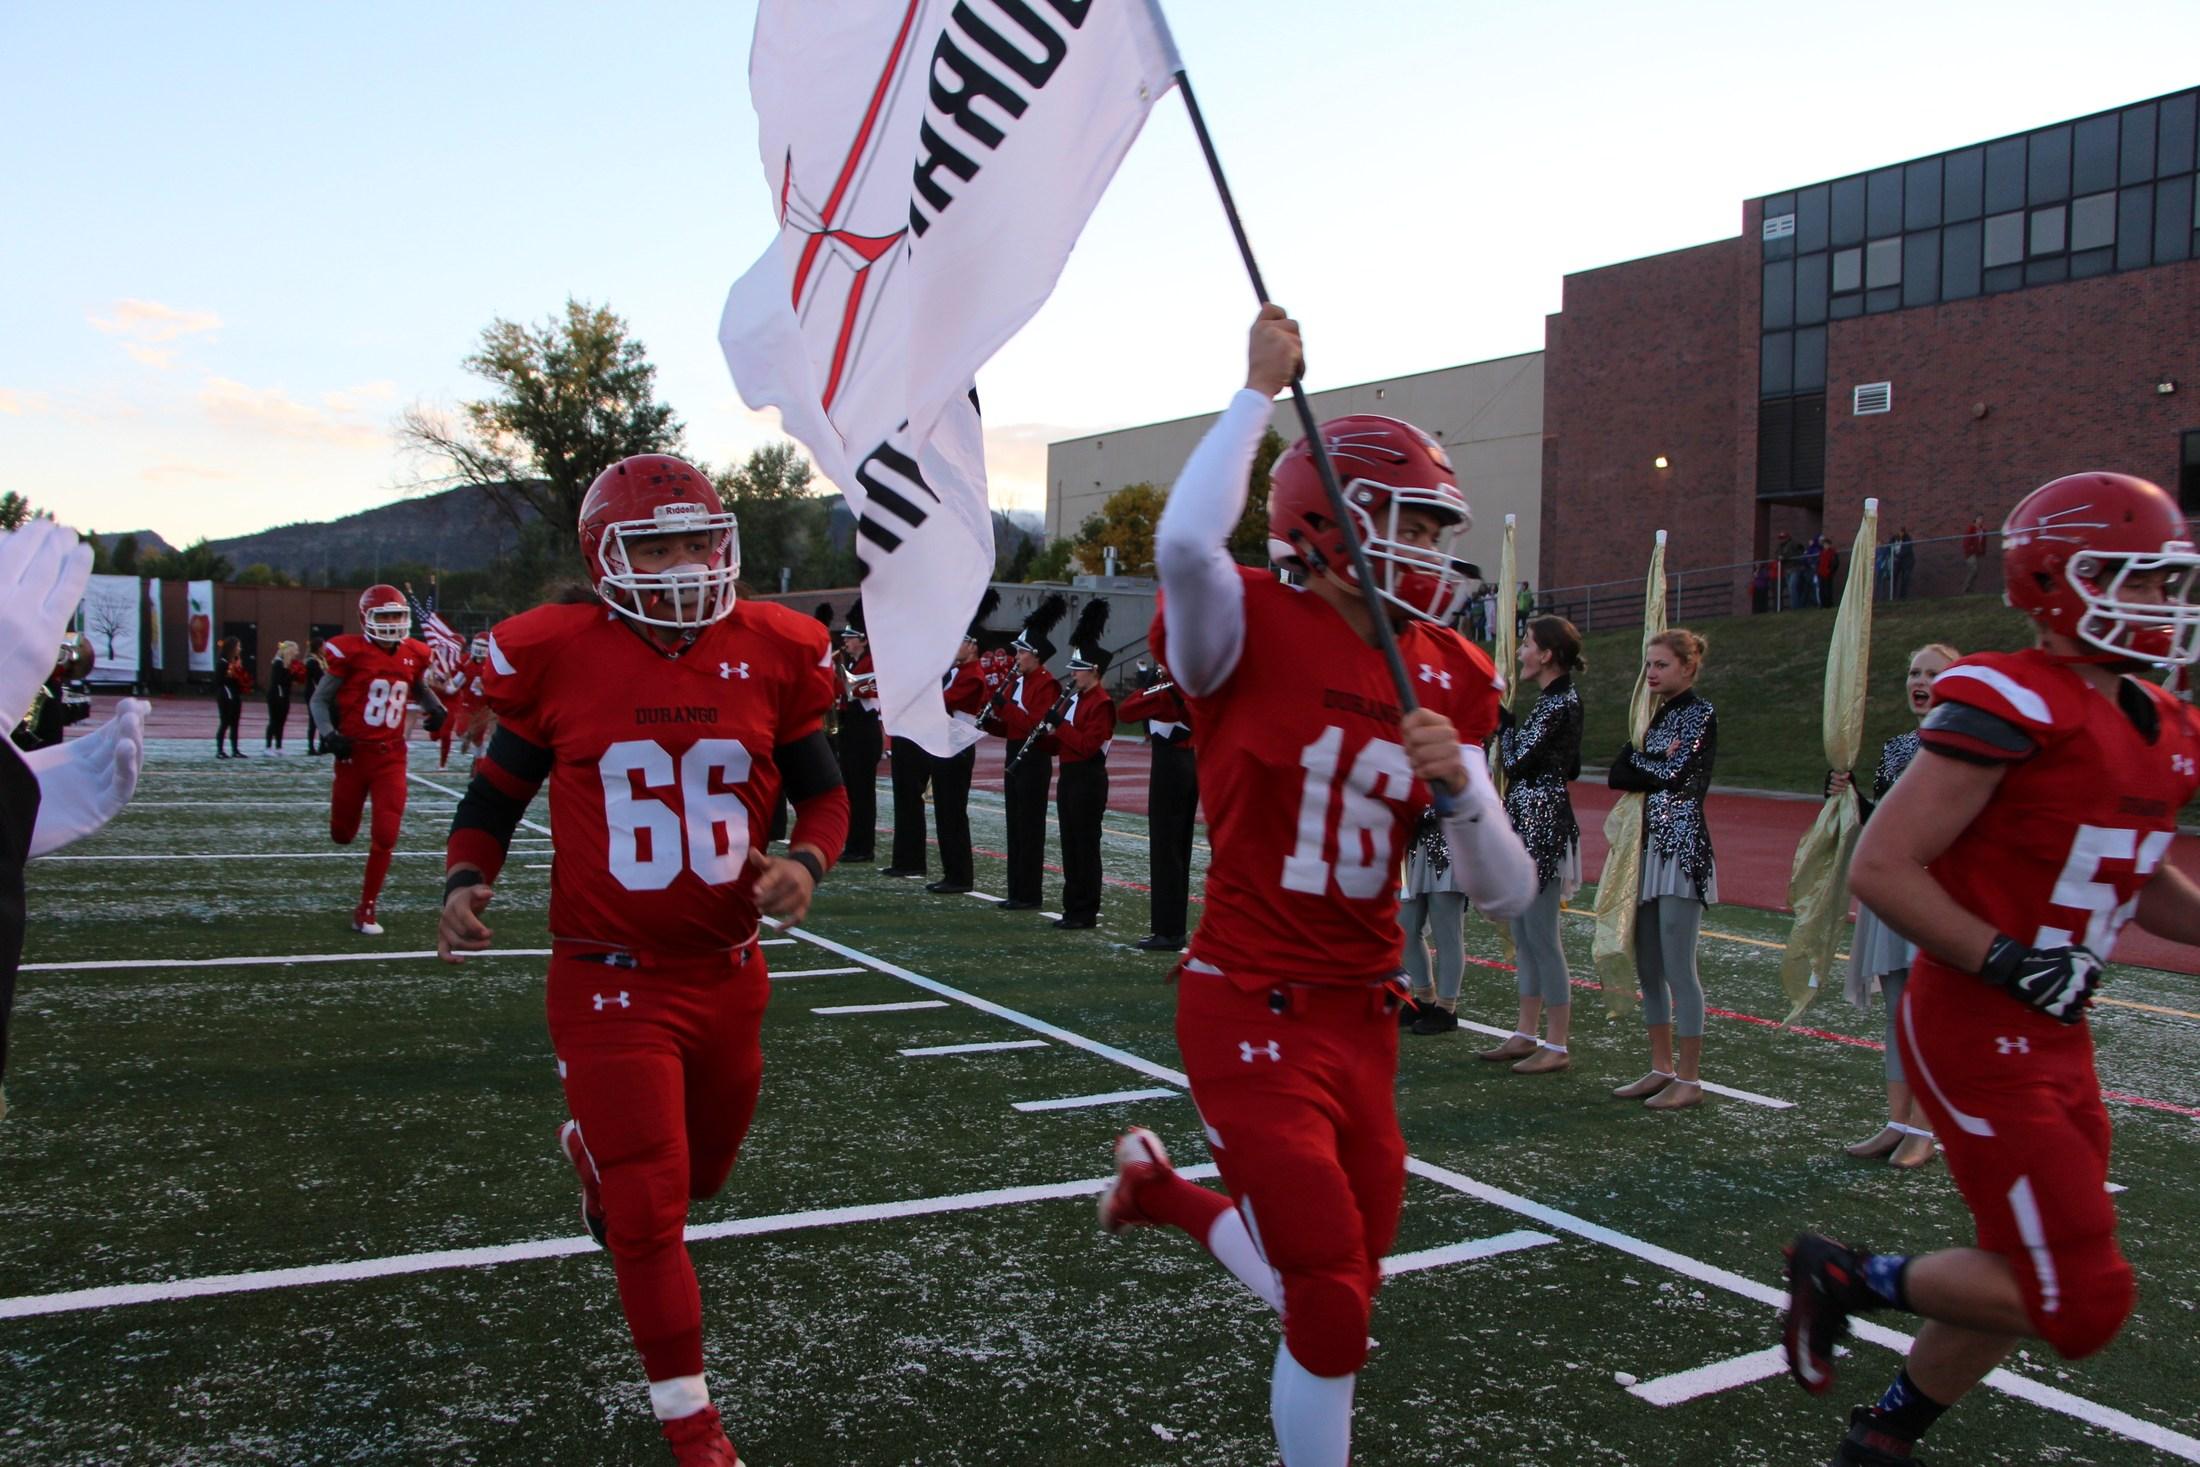 Demon players waving Demon football flag across football field